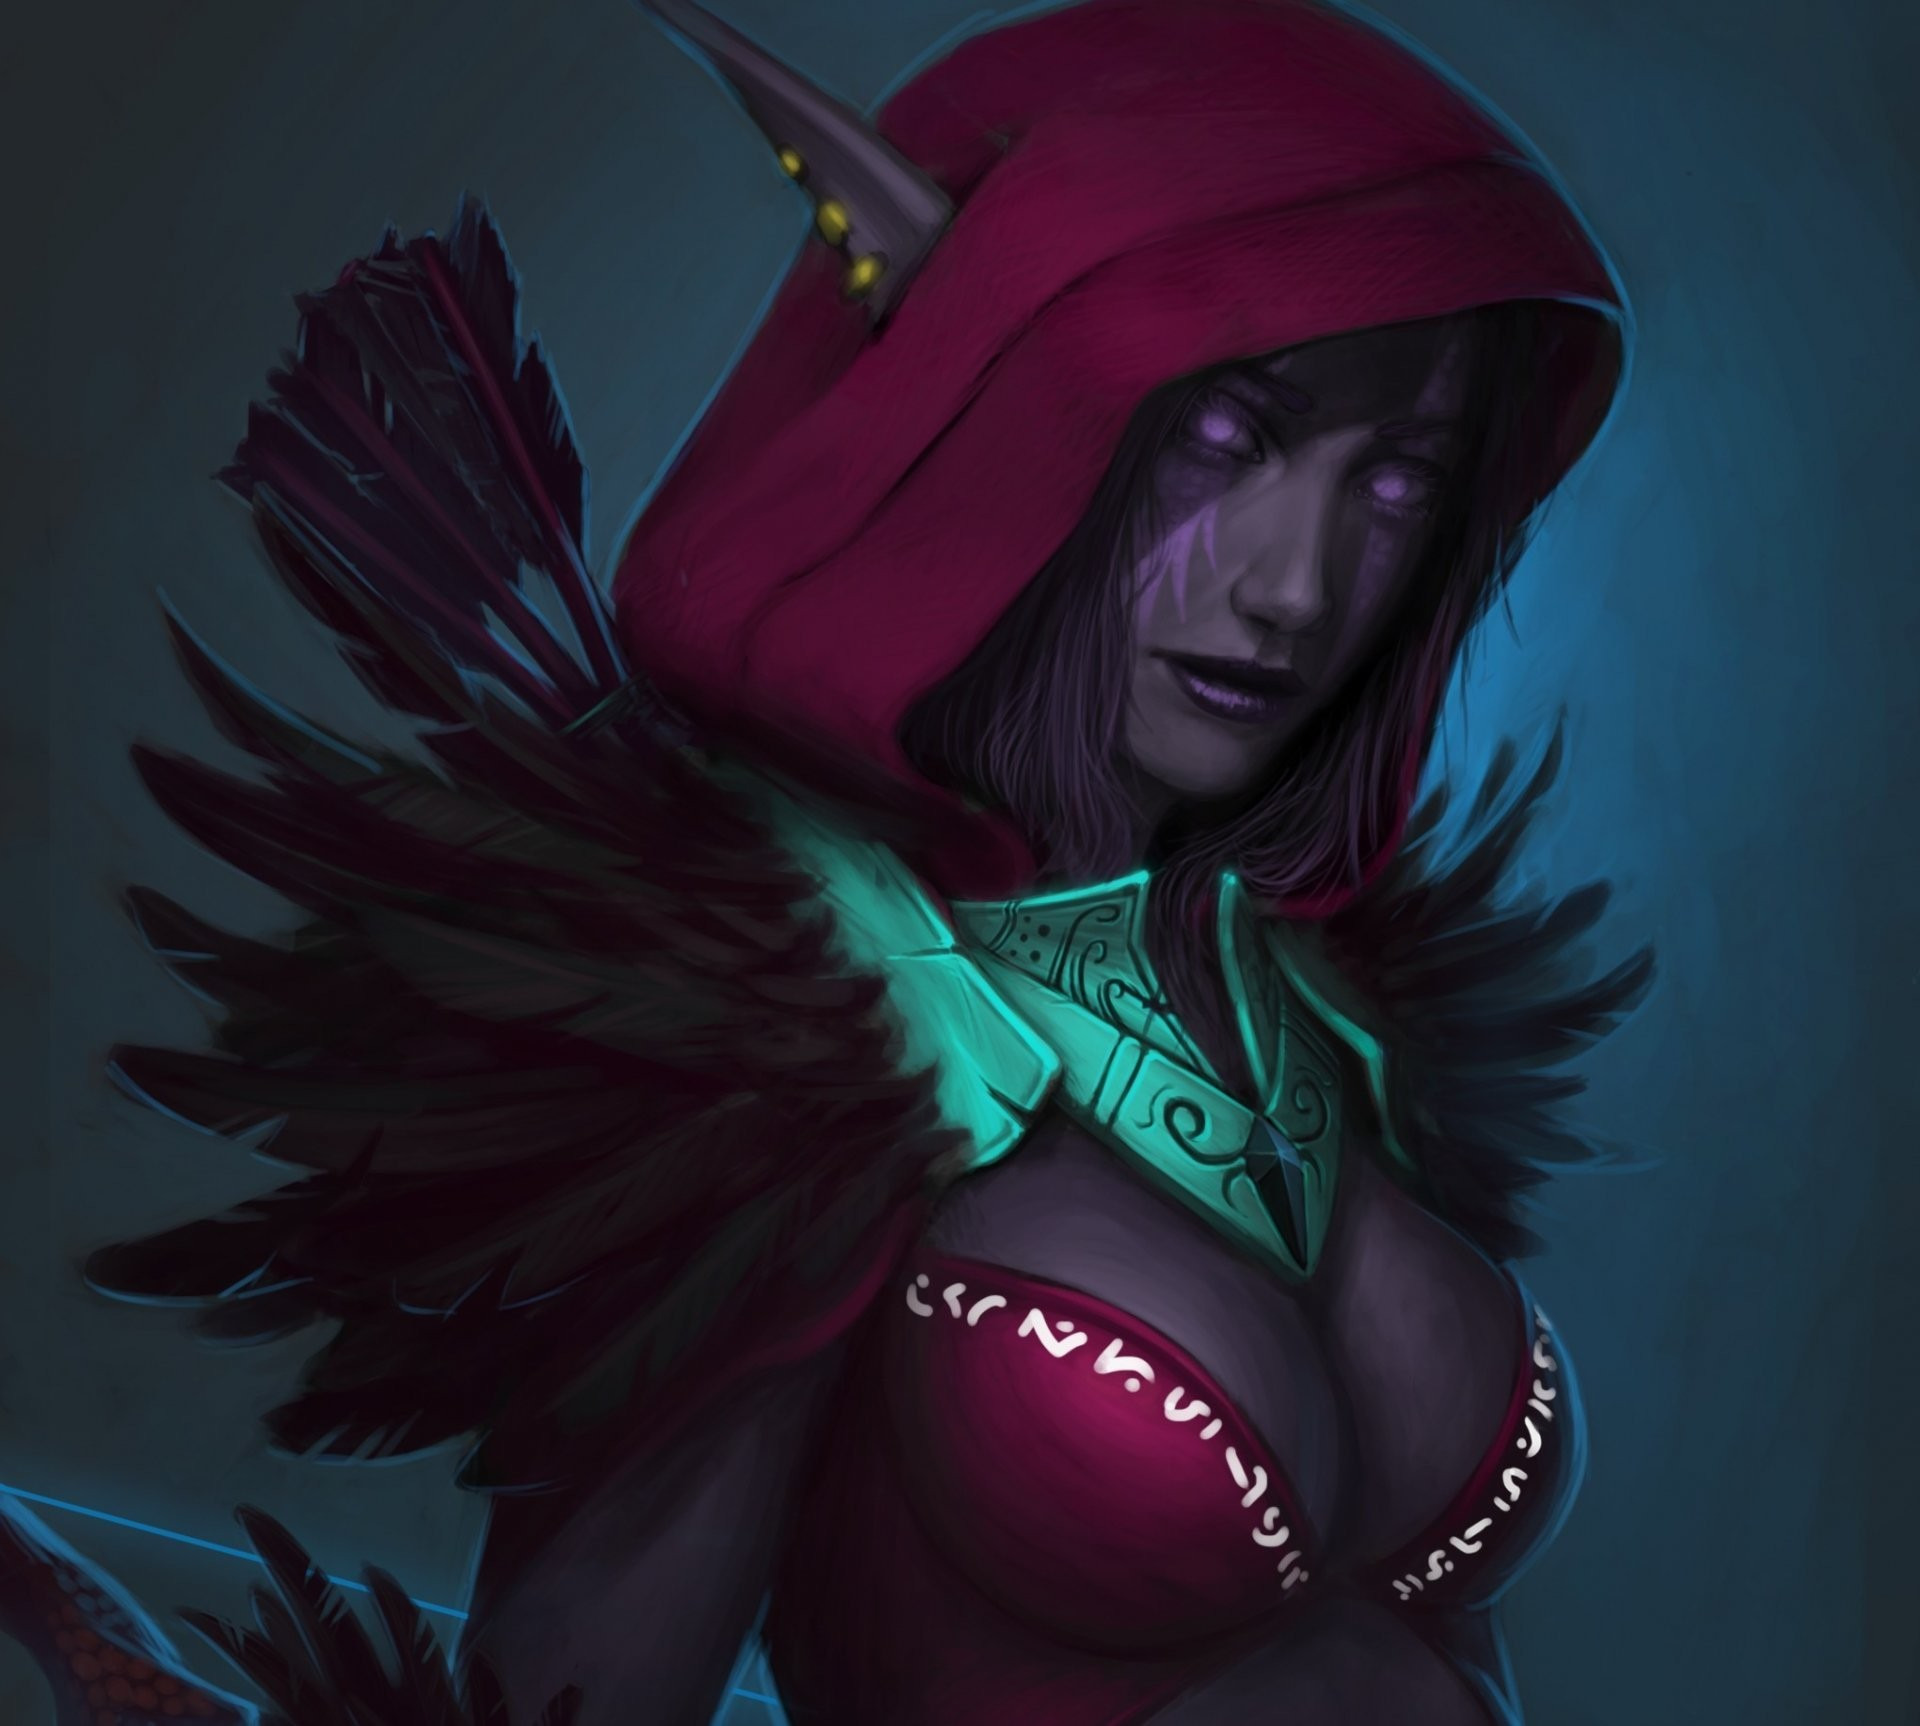 art wow world of warcraft night elf elf hood feathers